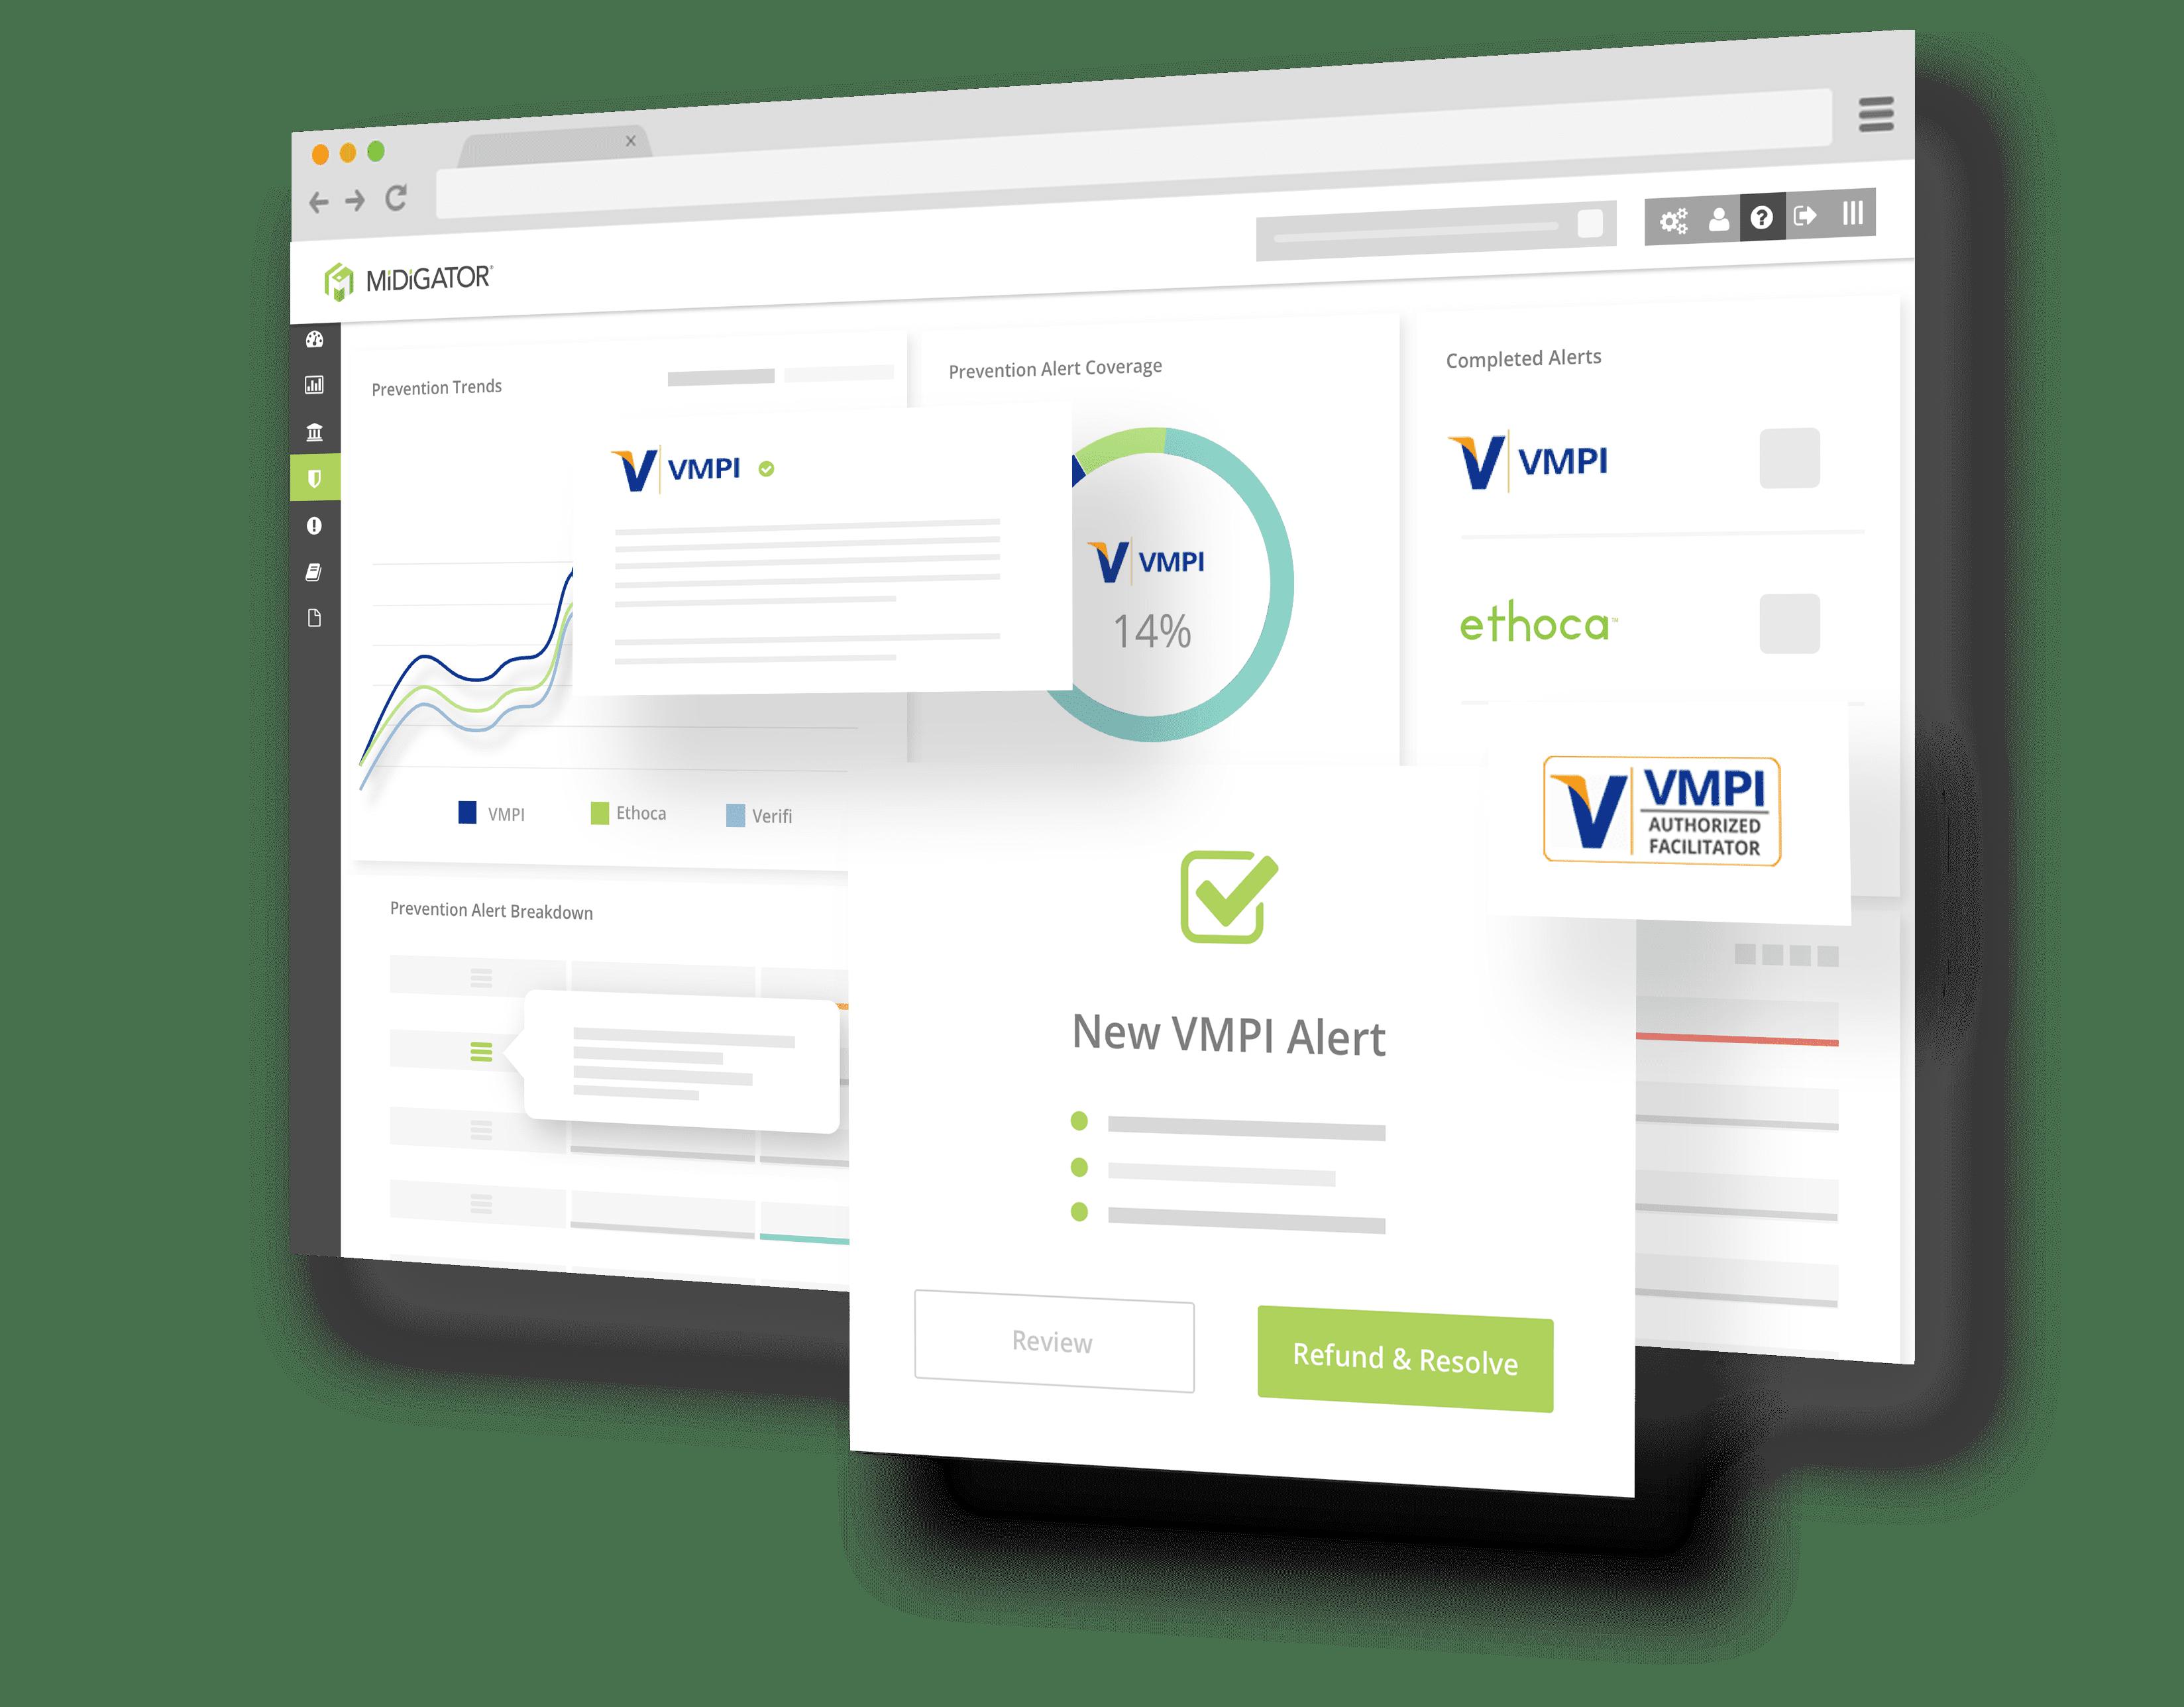 vmpi-browser-left